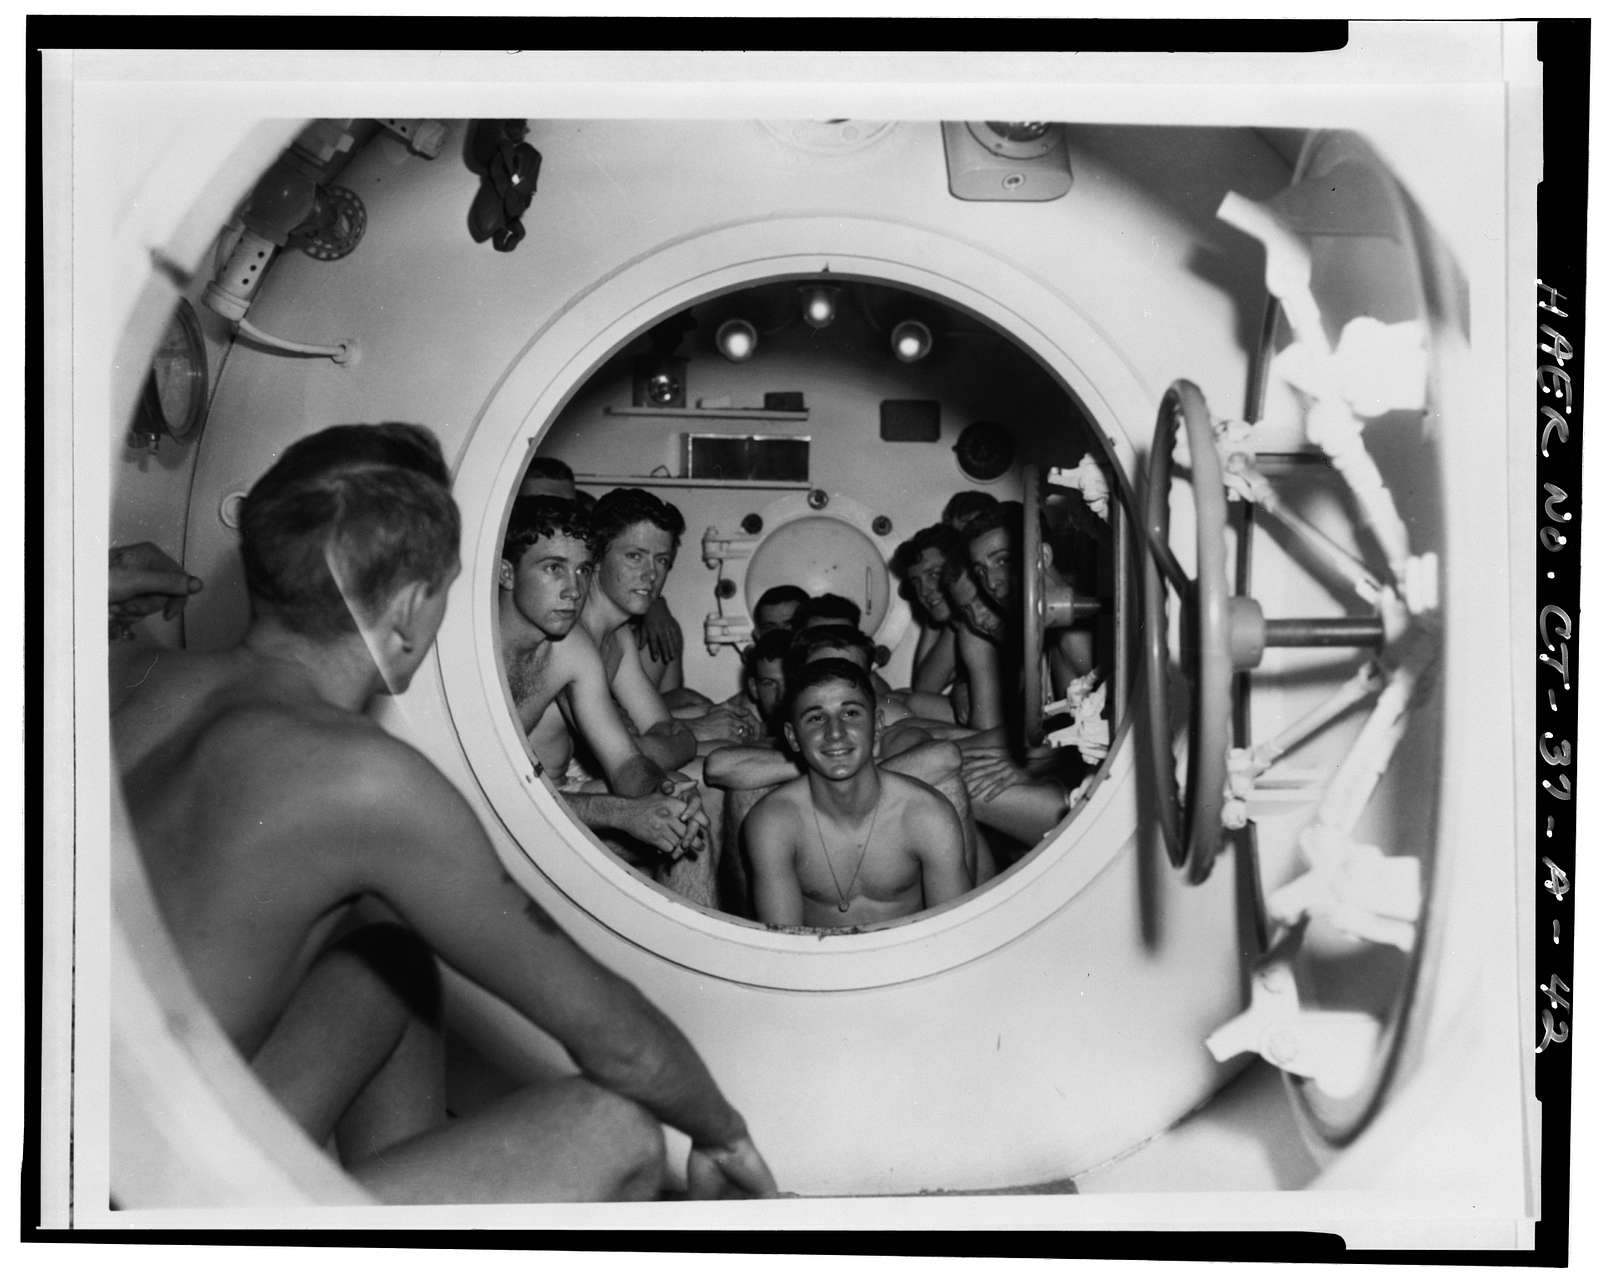 U.S. Naval Submarine Base, New London Submarine Escape Training Tank, Albacore & Darter Roads, Groton, New London County, CT